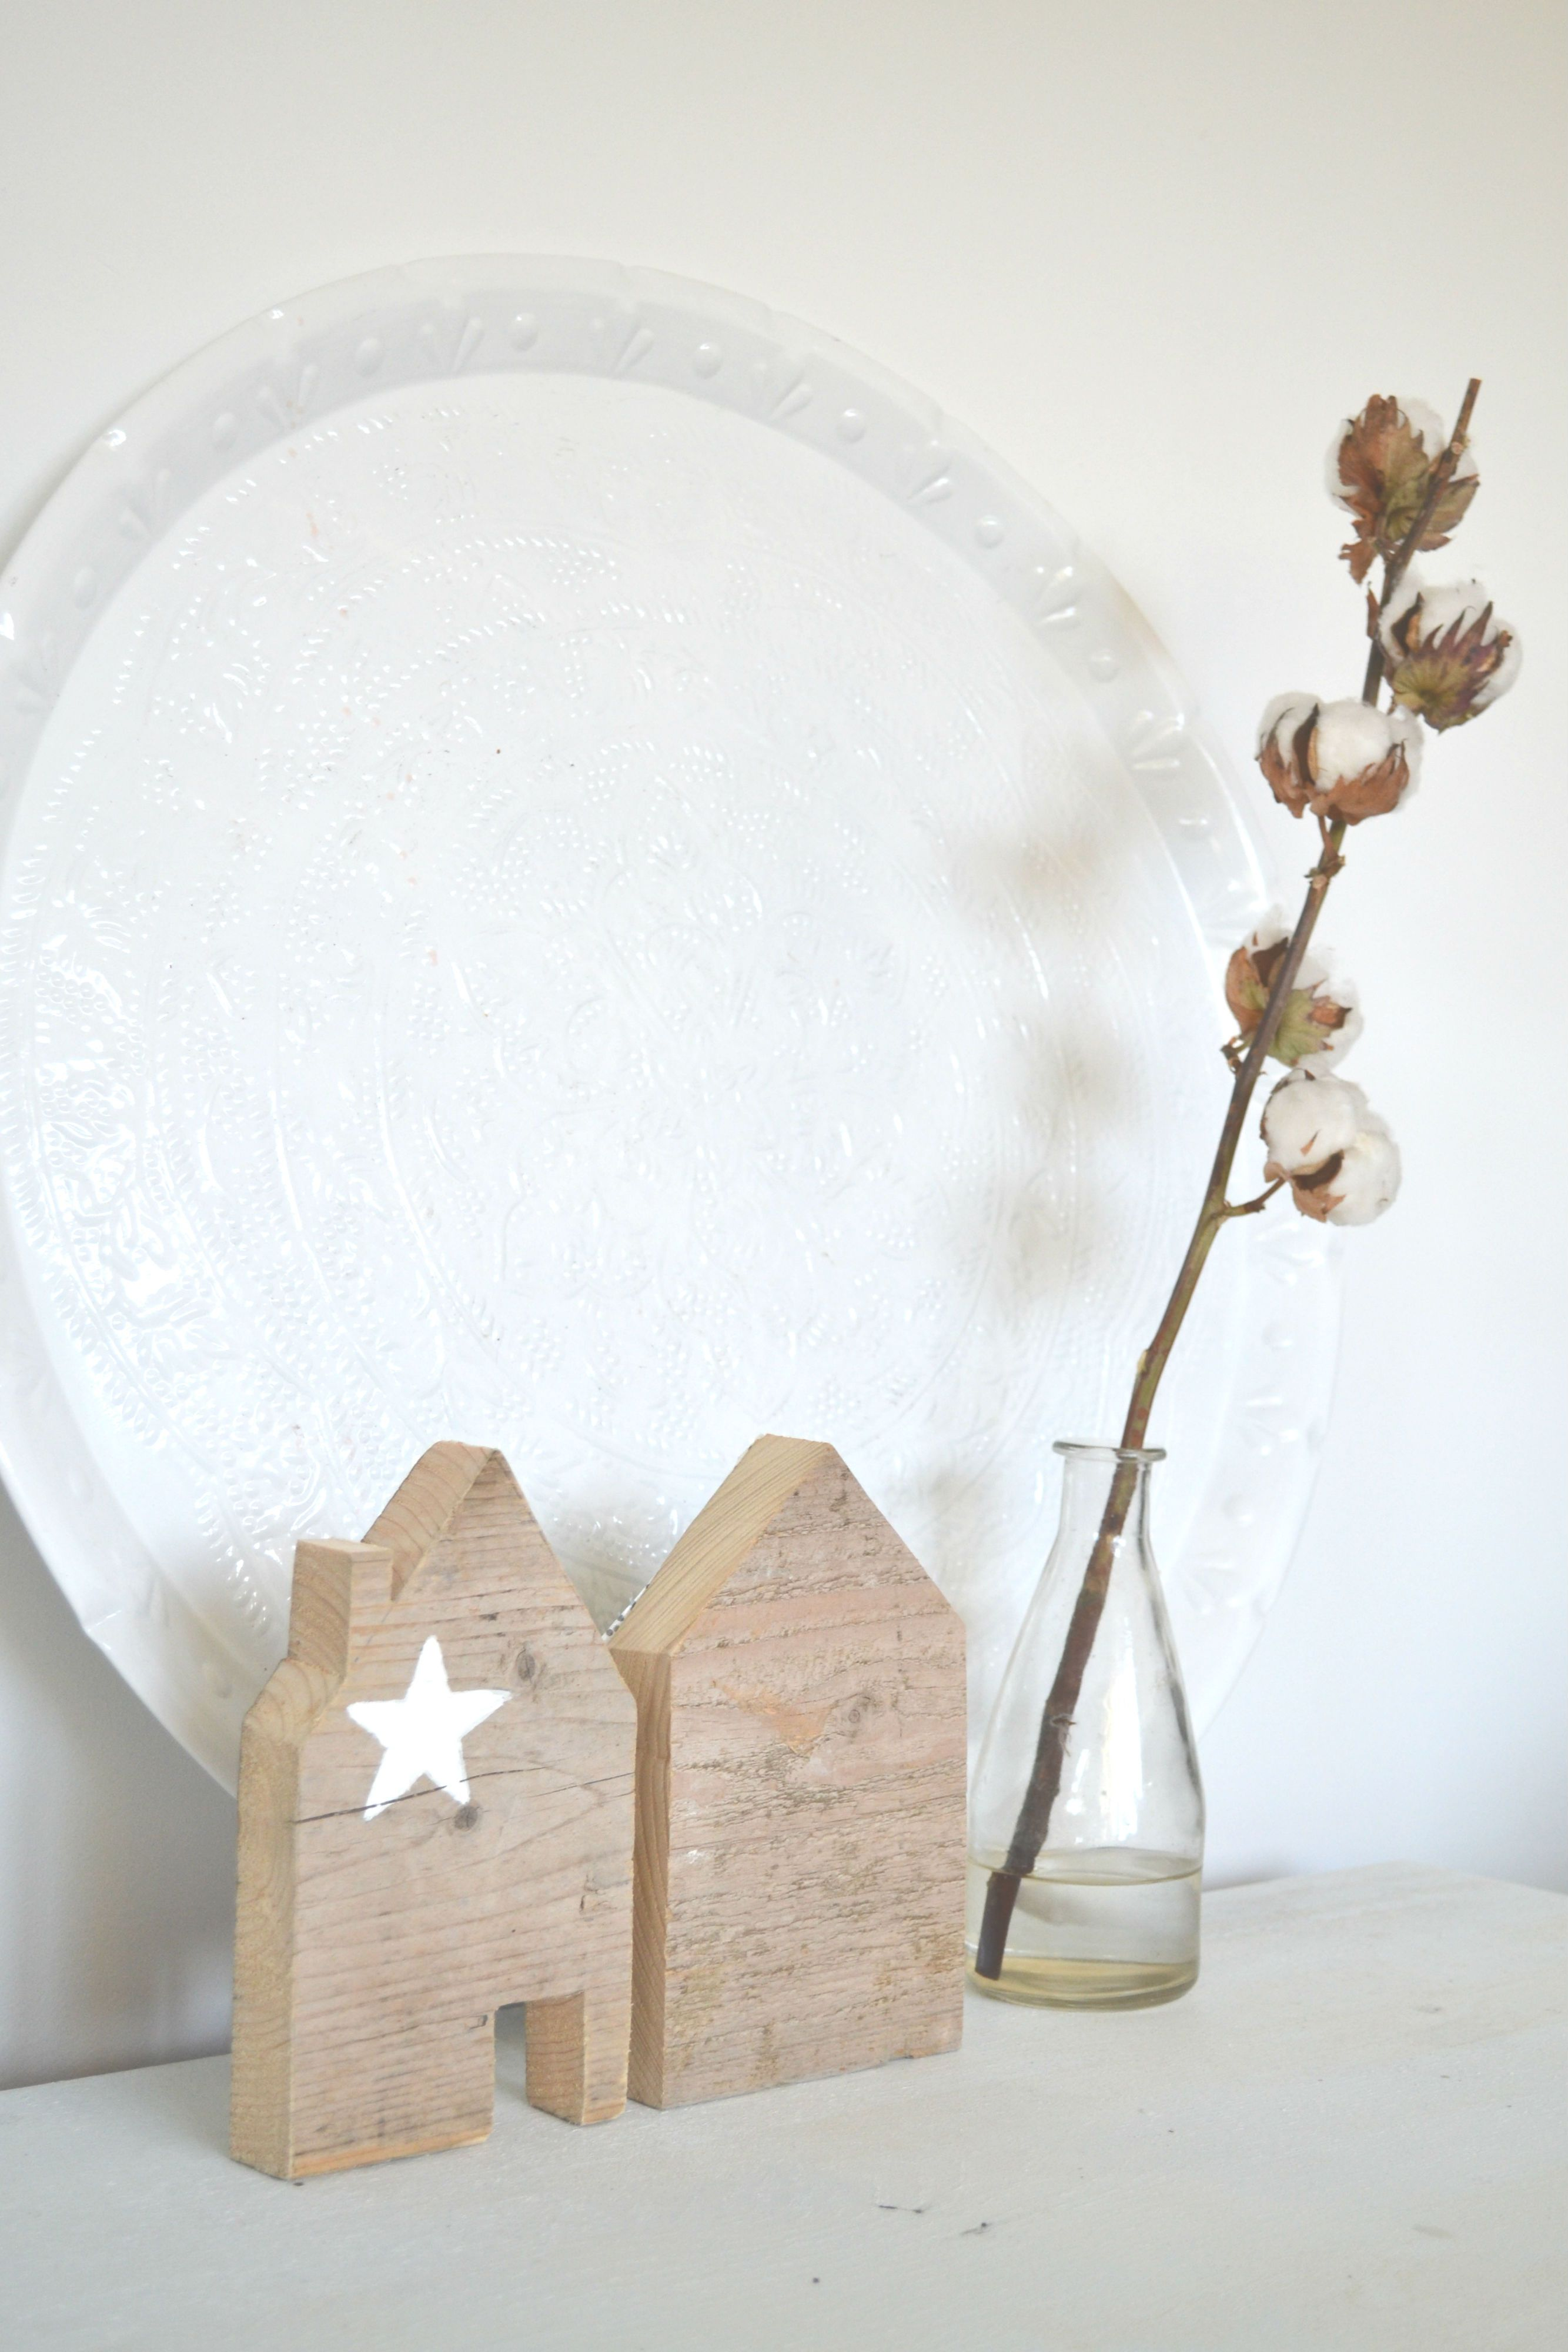 holzh uschen rundweg pinterest holzh uschen holz. Black Bedroom Furniture Sets. Home Design Ideas